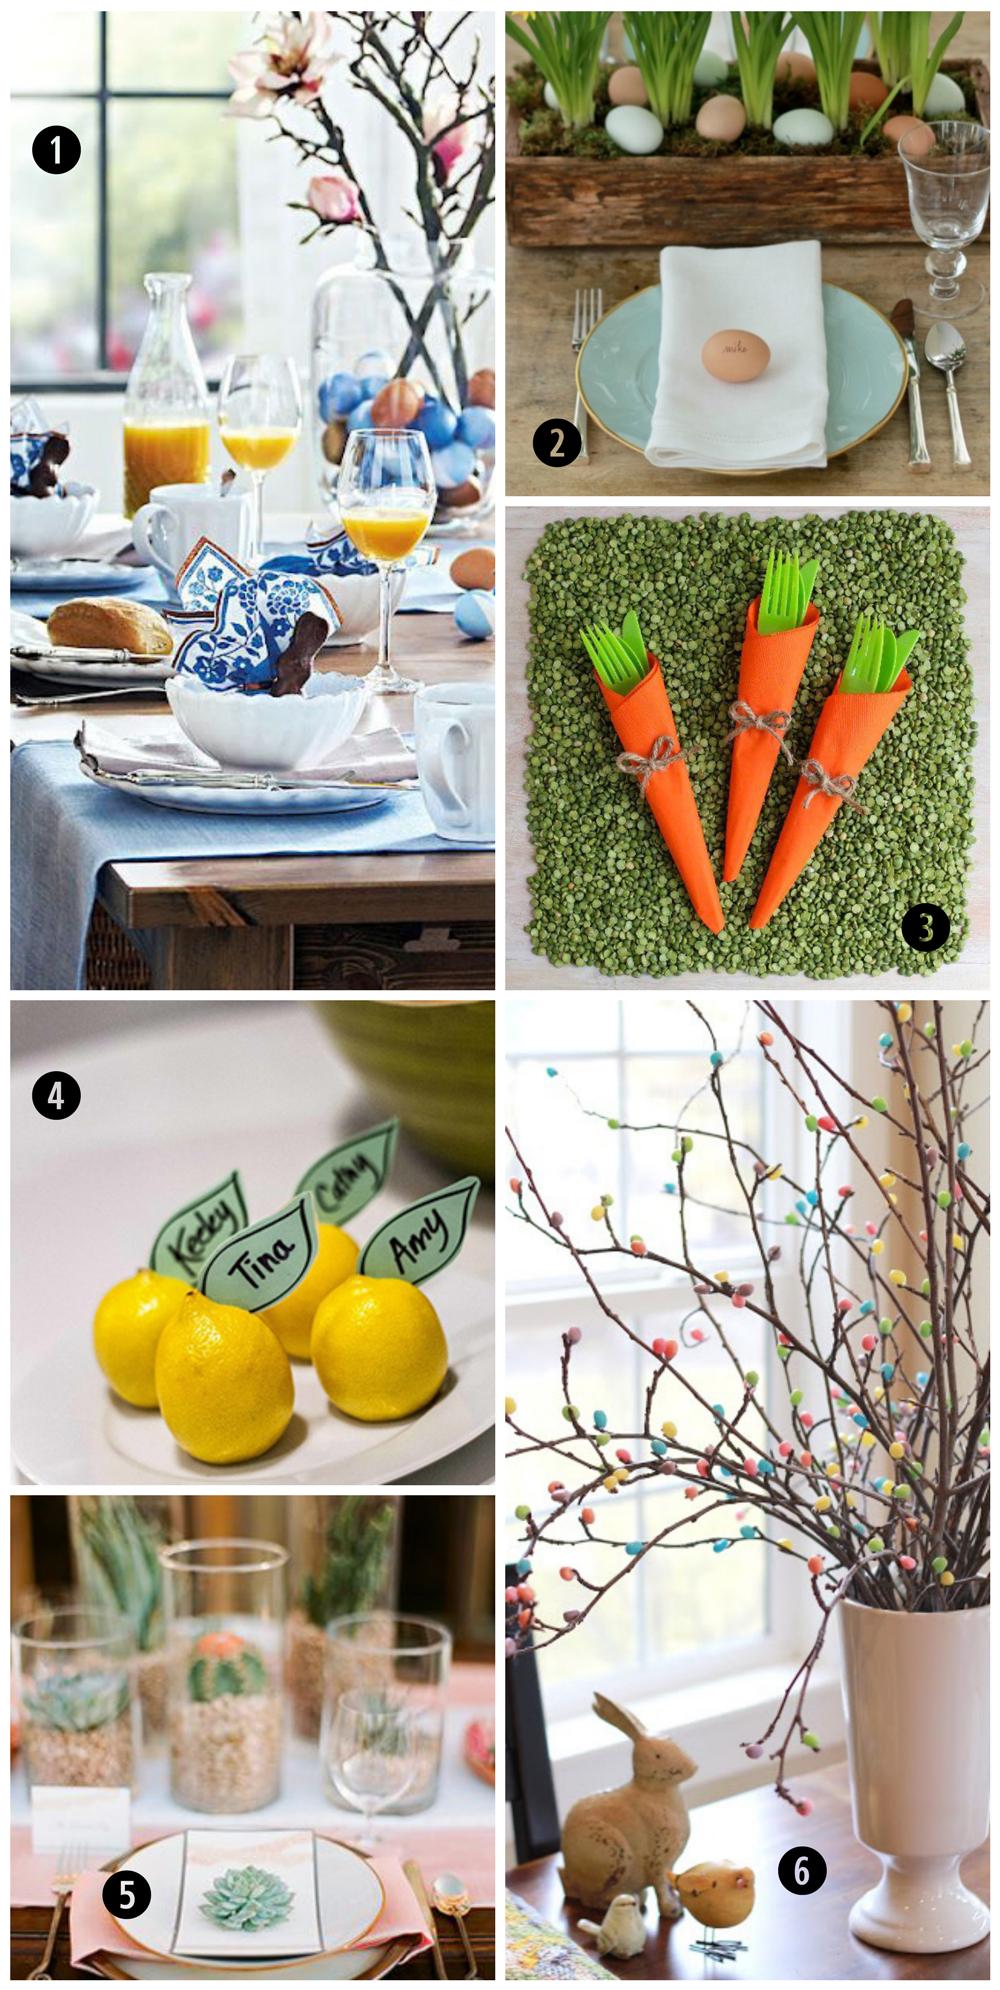 Easter Table Settings & Decor